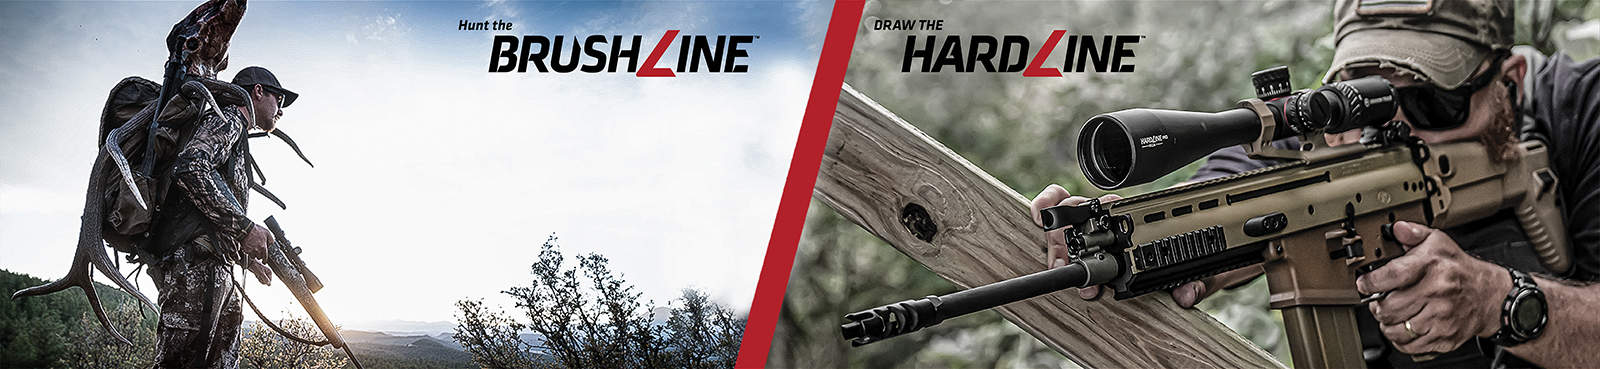 Introducing Hardline and Brushline by Crimson Trace